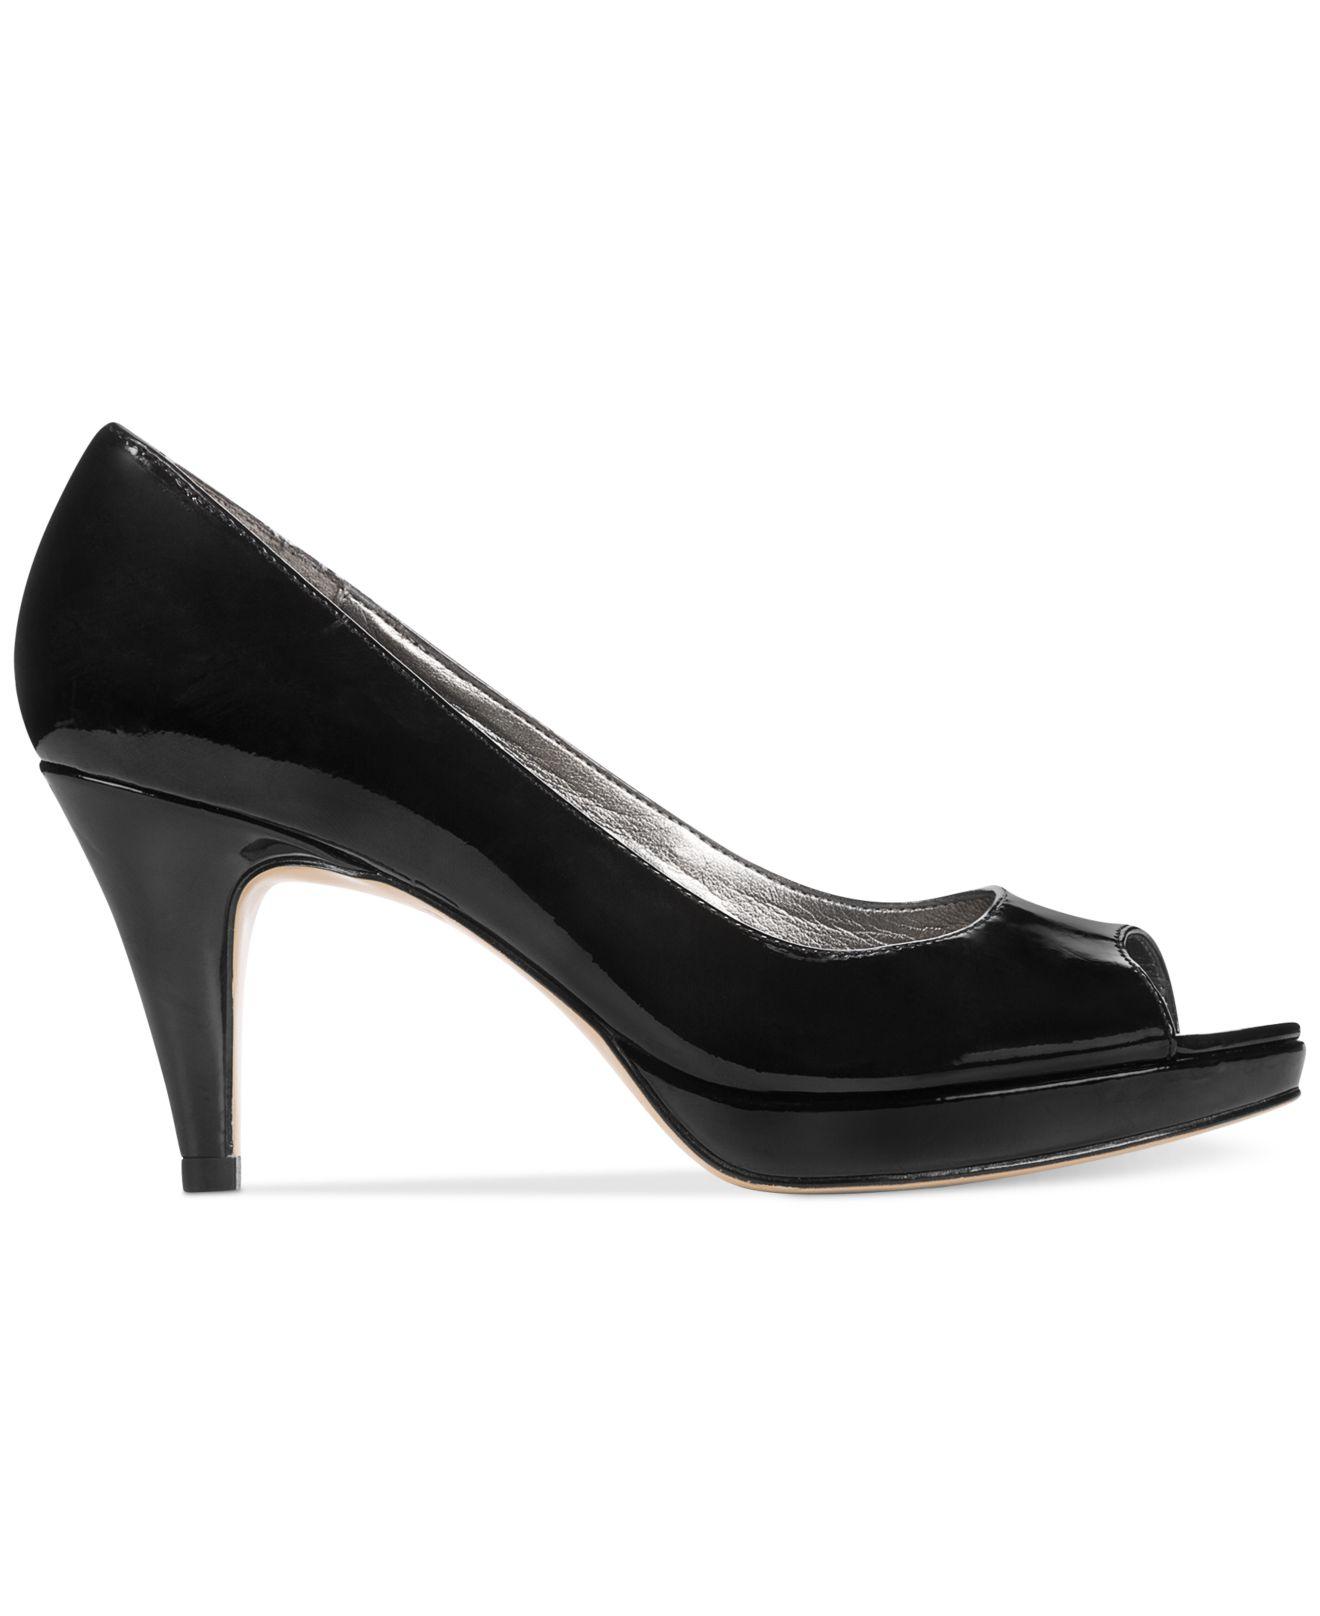 e396dadf8b53 Lyst - Bandolino Mylah Peep Toe Pumps in Black